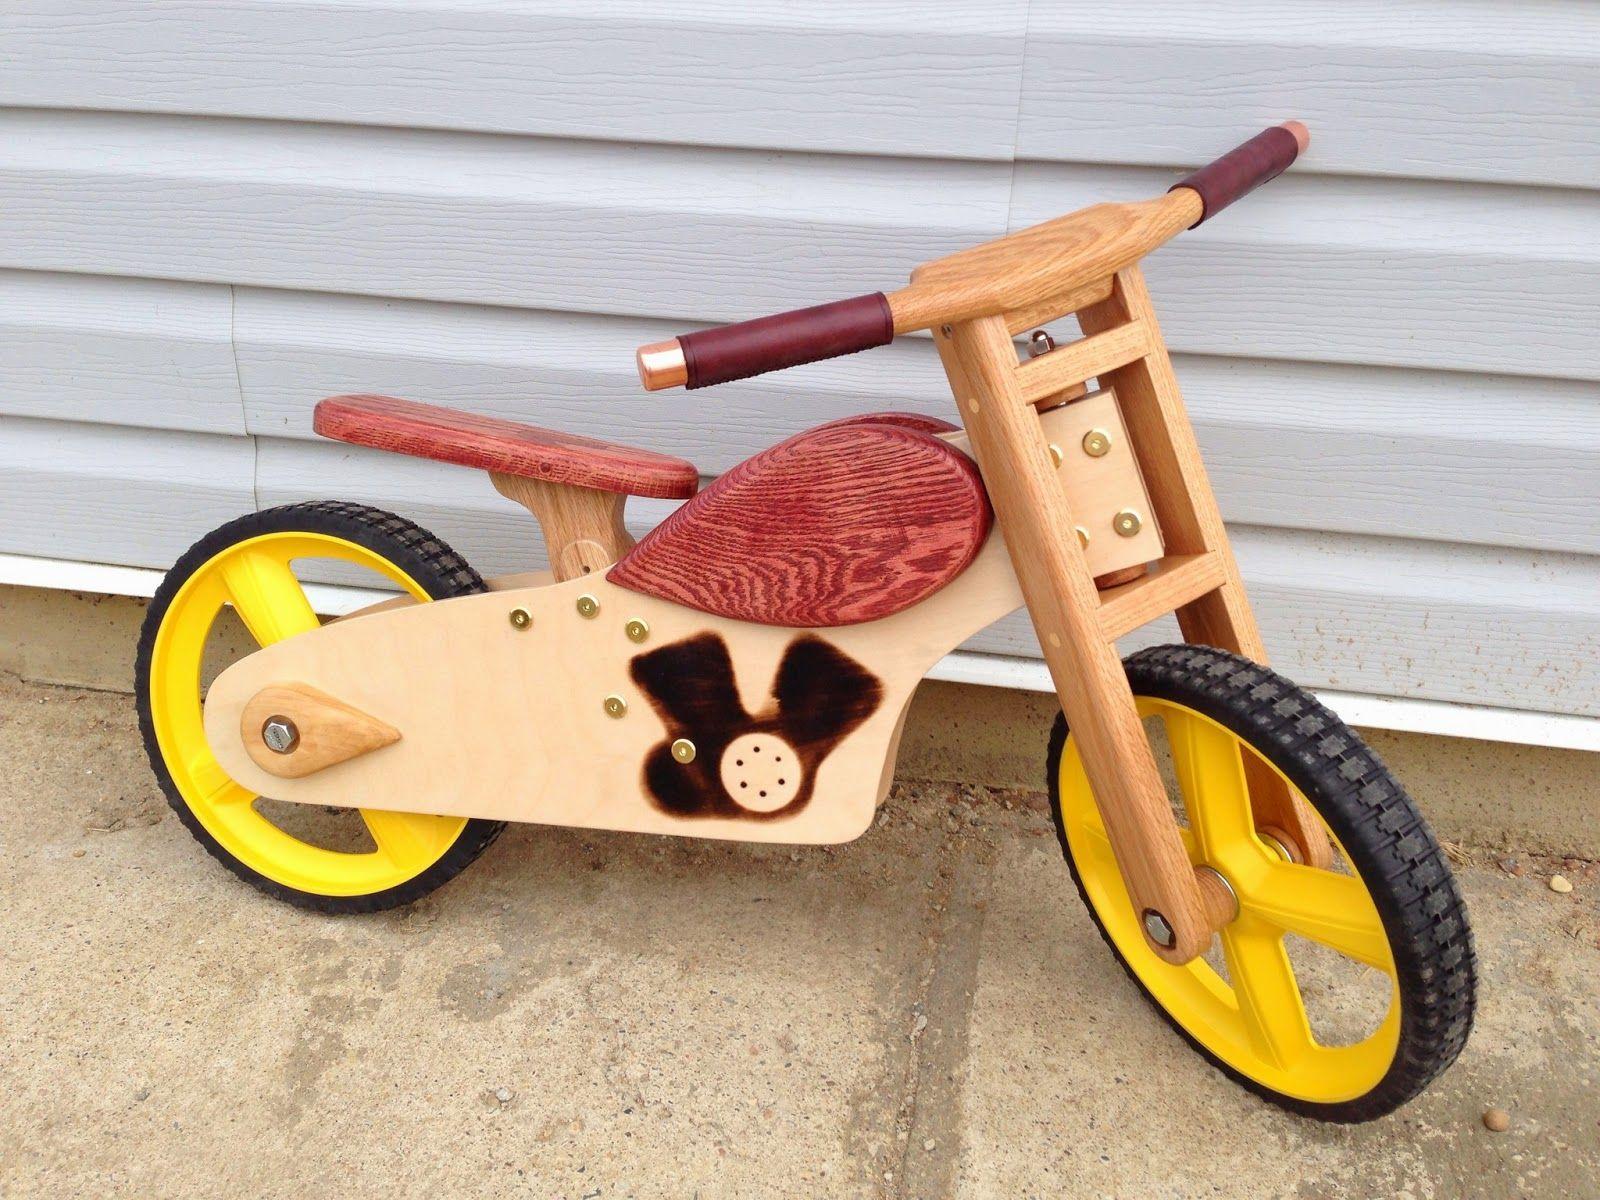 Wooden Push Bike Http Makeperday Blogspot Com 2013 05 Project